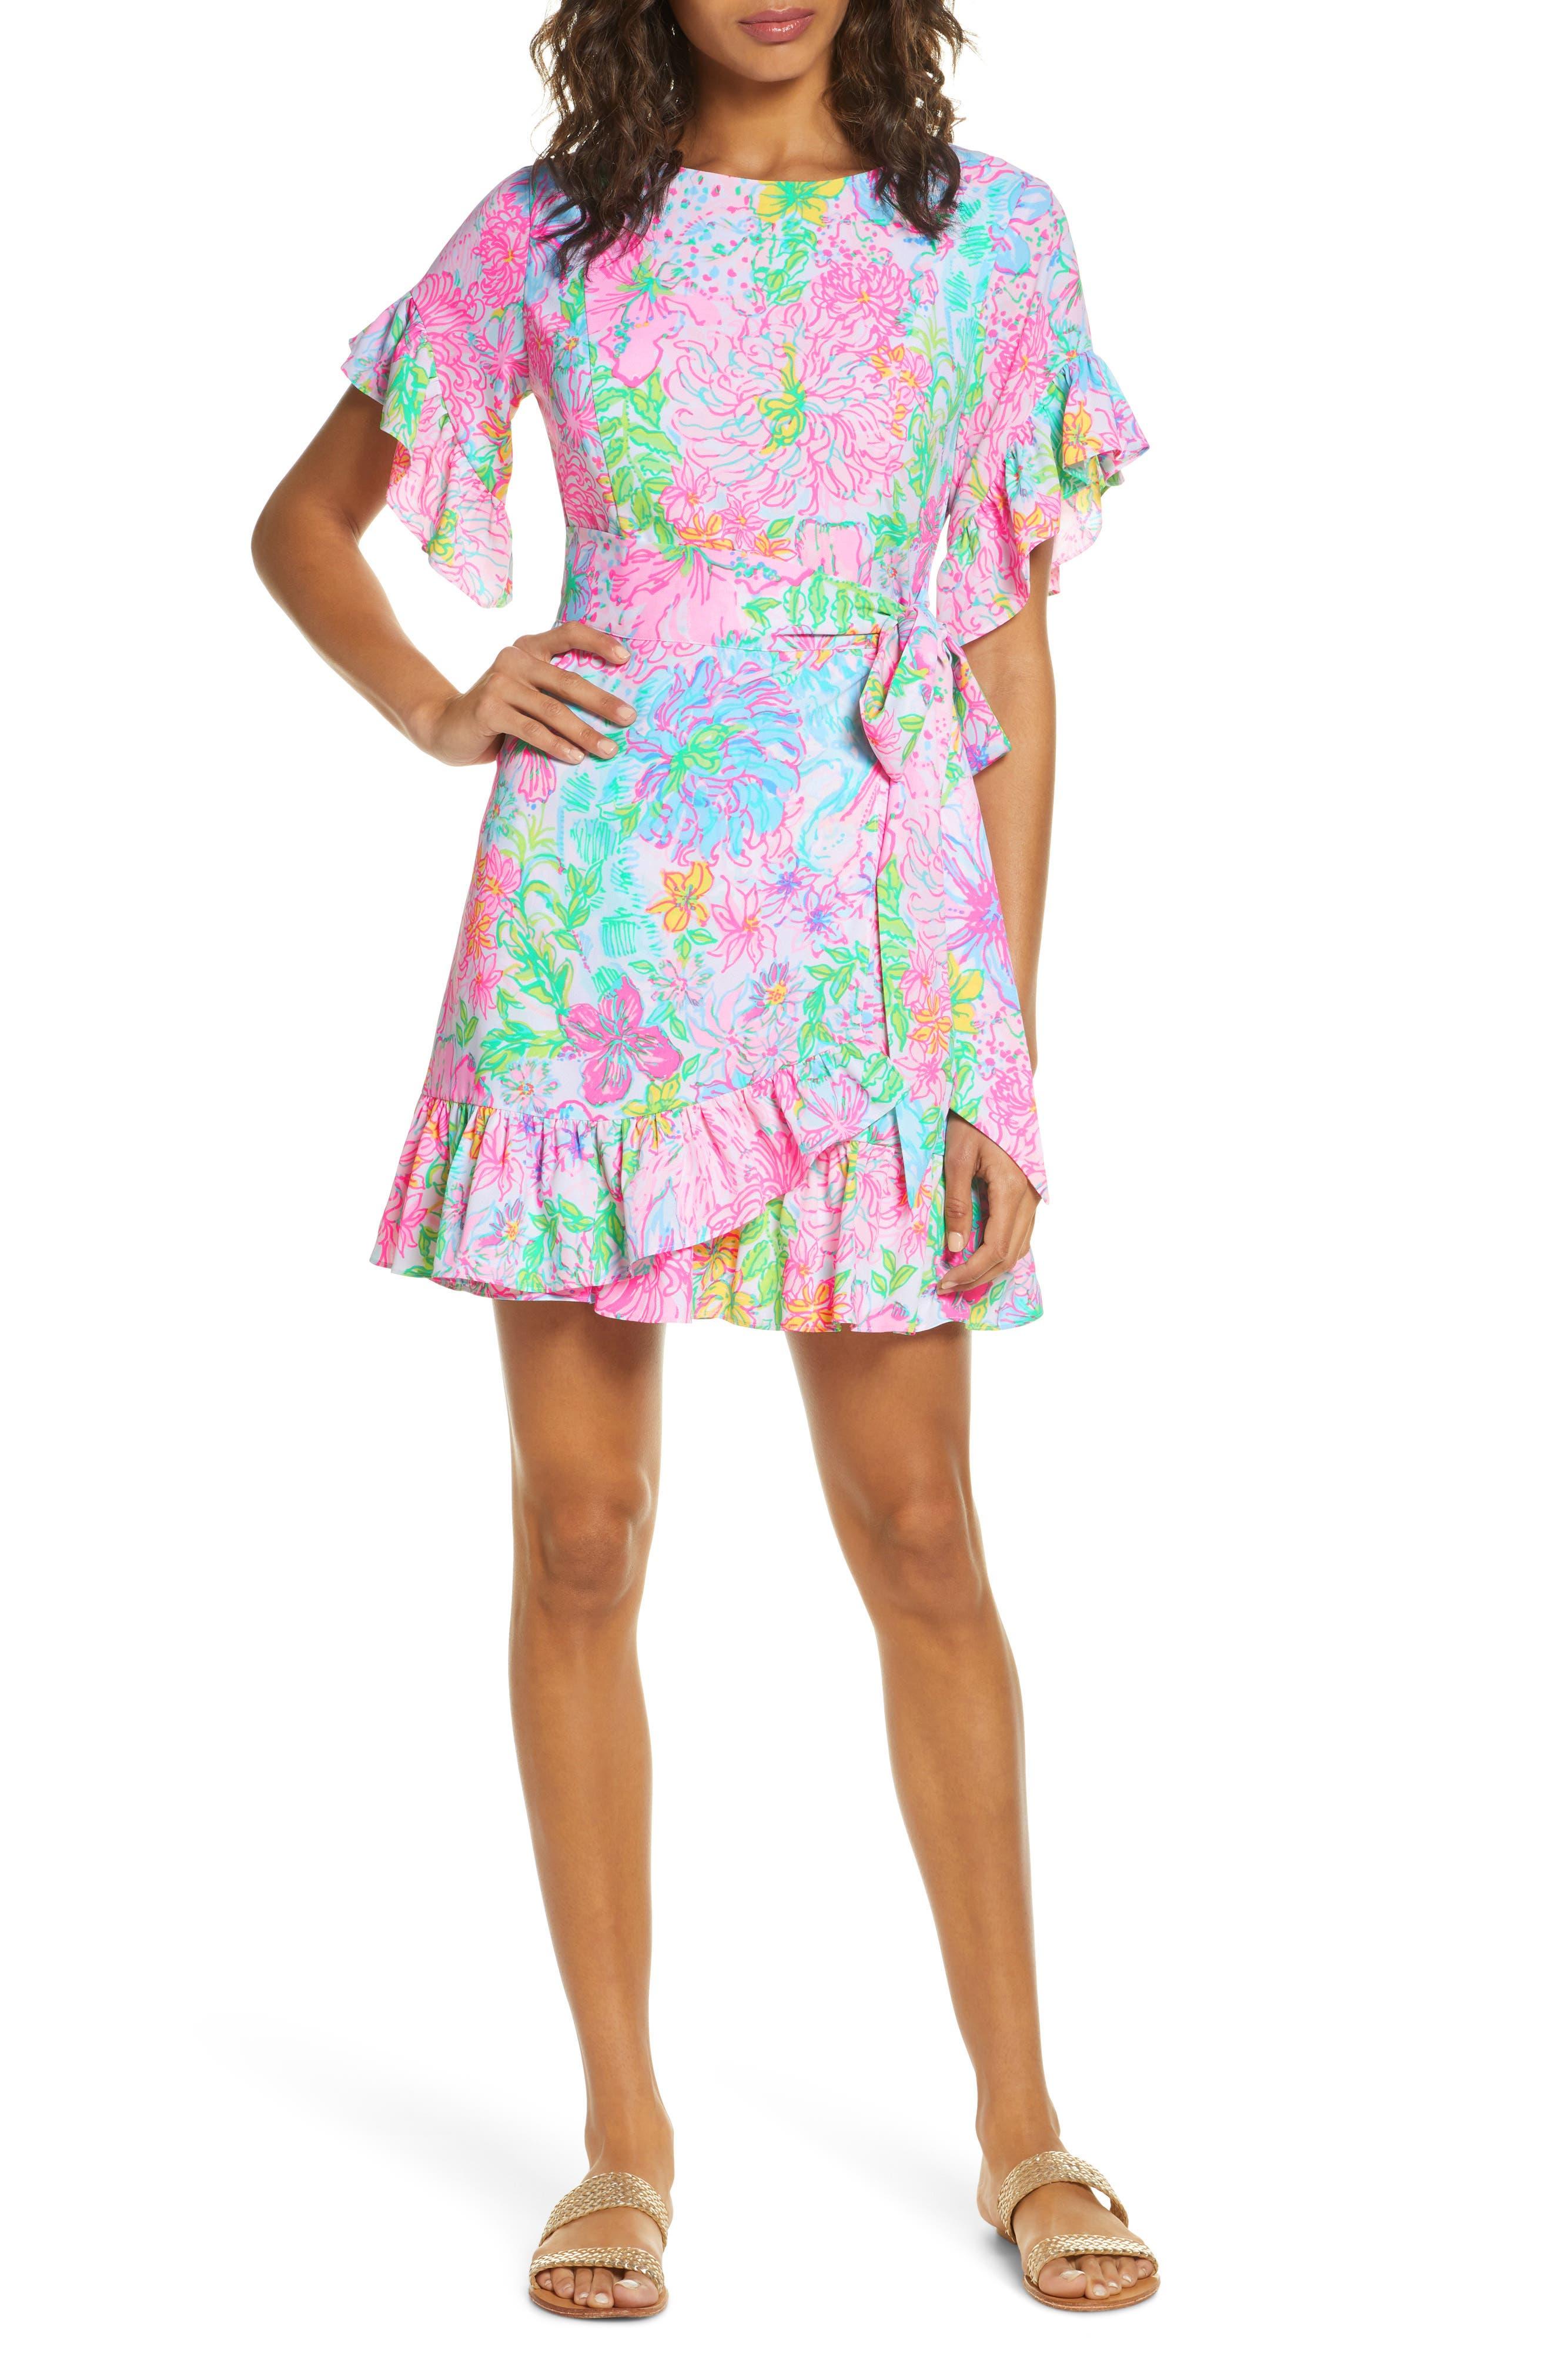 Women's Lilly Pulitzer Darlah Ruffle Dress